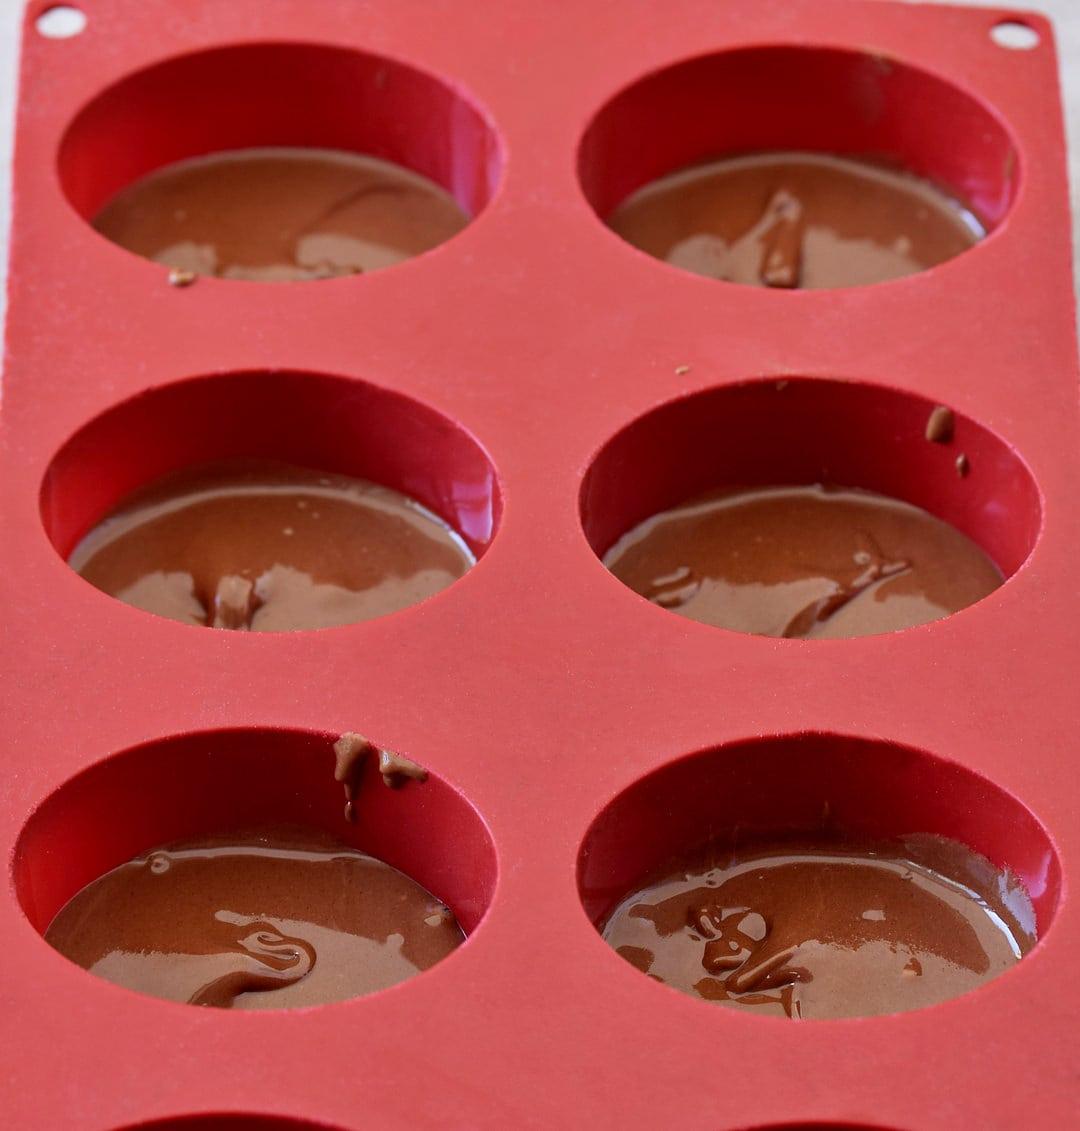 silikonform mit veganer schokoladencreme